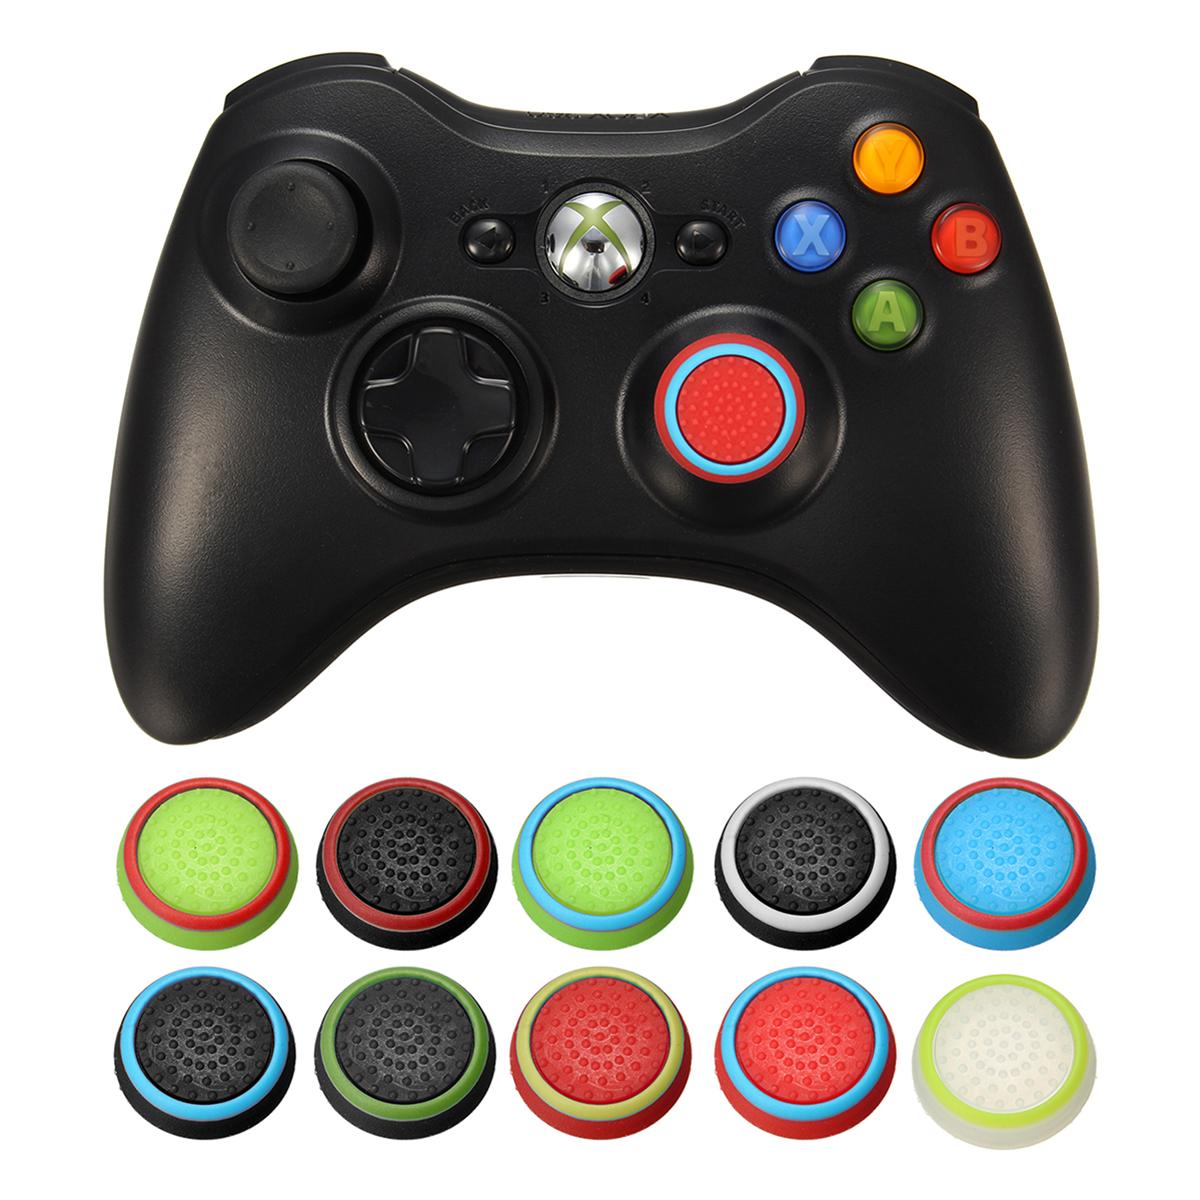 Rubber Silicone Thumbstick Joystick Cap Thumbstick Cover Grips For PS4 For PS3 For Xbox One For XBOX360 Wireless Controller 6